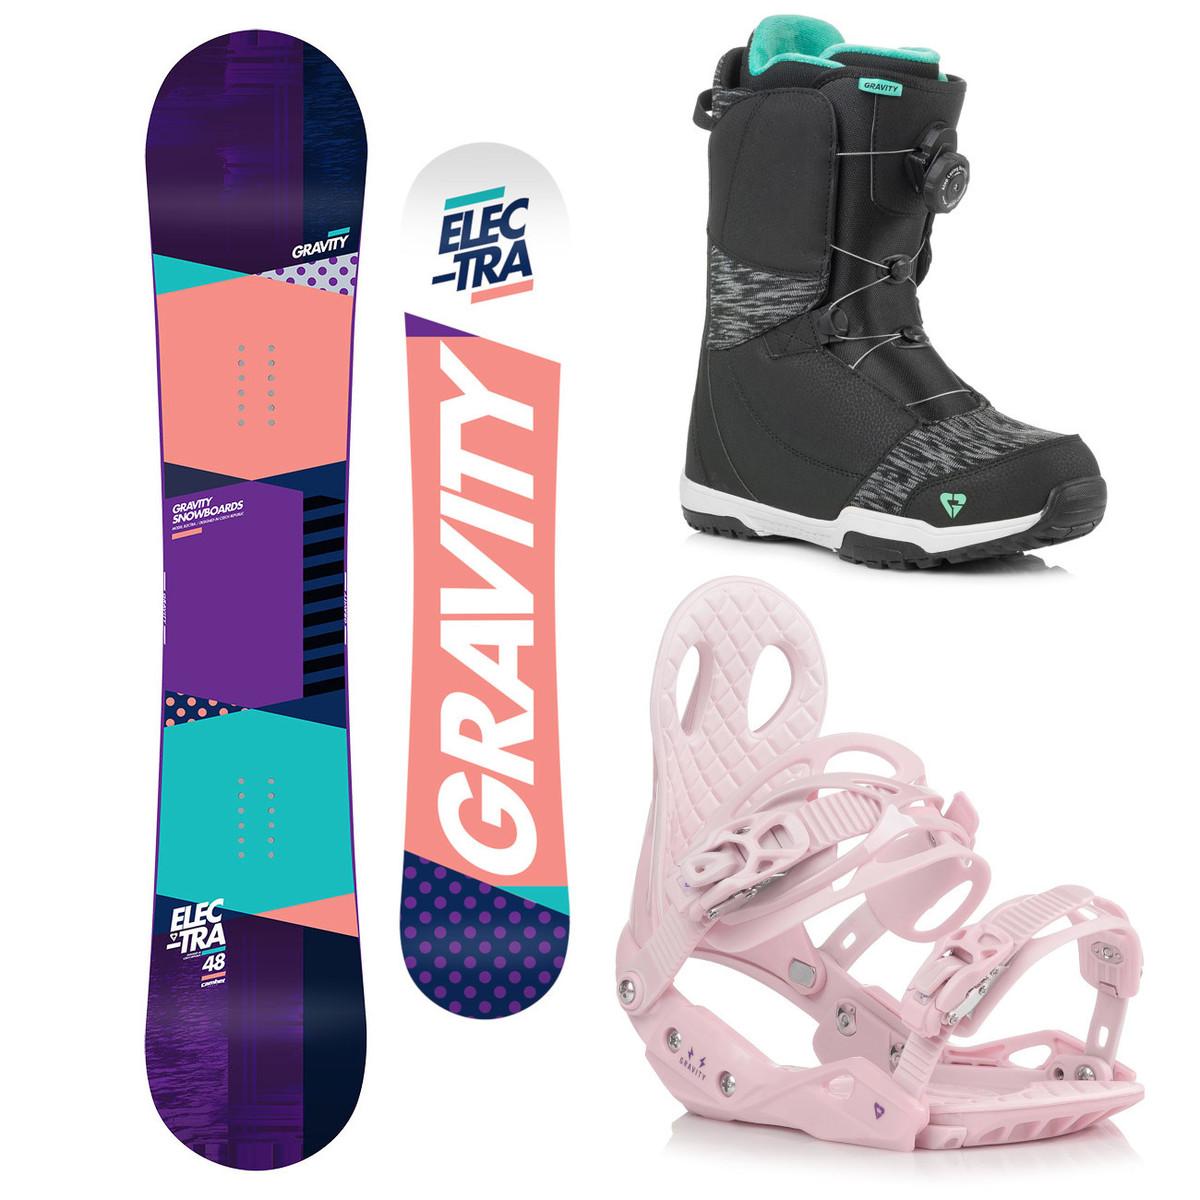 Snowboardový komplet Gravity Electra 18/19 M (EU 37-42) 151 Růžová